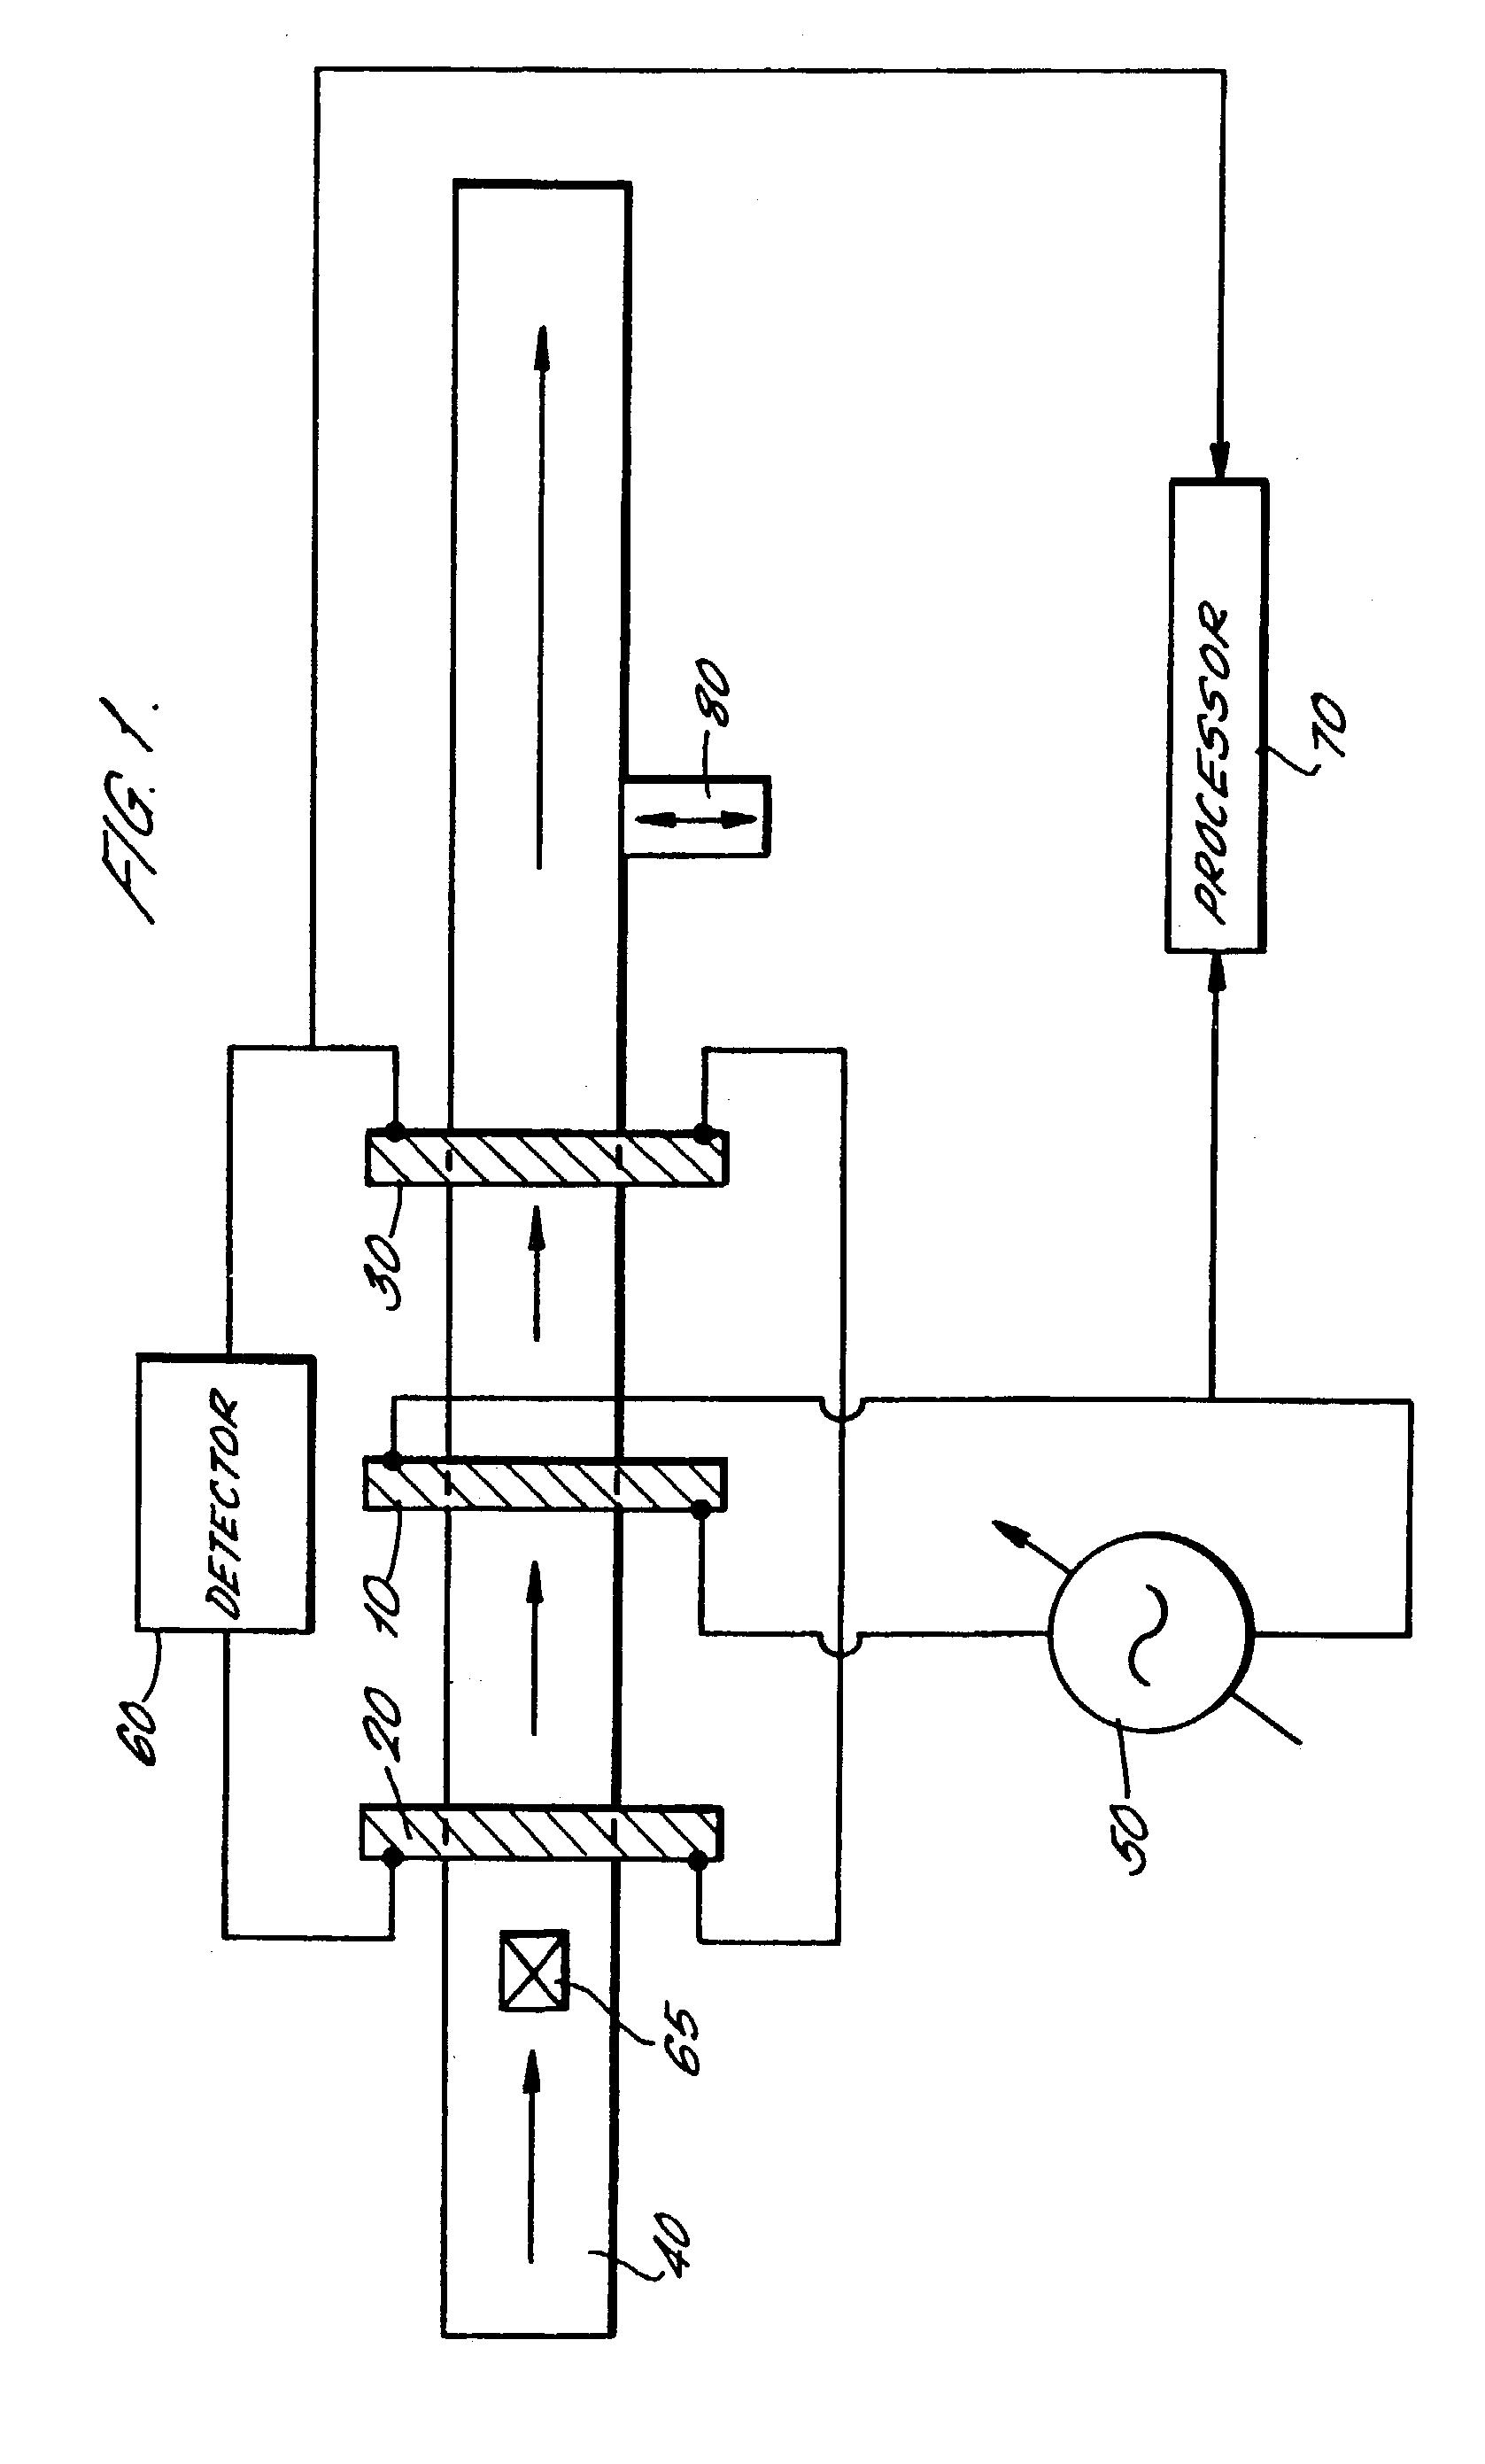 Metal Detector Wiring Diagrams Auto Electrical Diagram And Cd4069 Measuringandtestcircuit Circuit Seekiccom Safeline 38 Data Acquisition